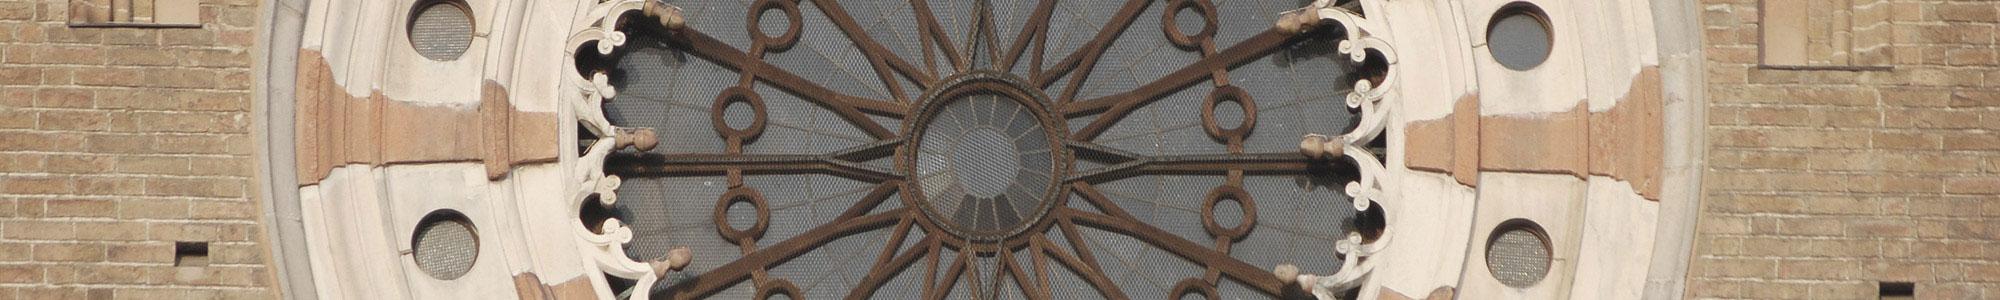 Rosone Duomo Lodi